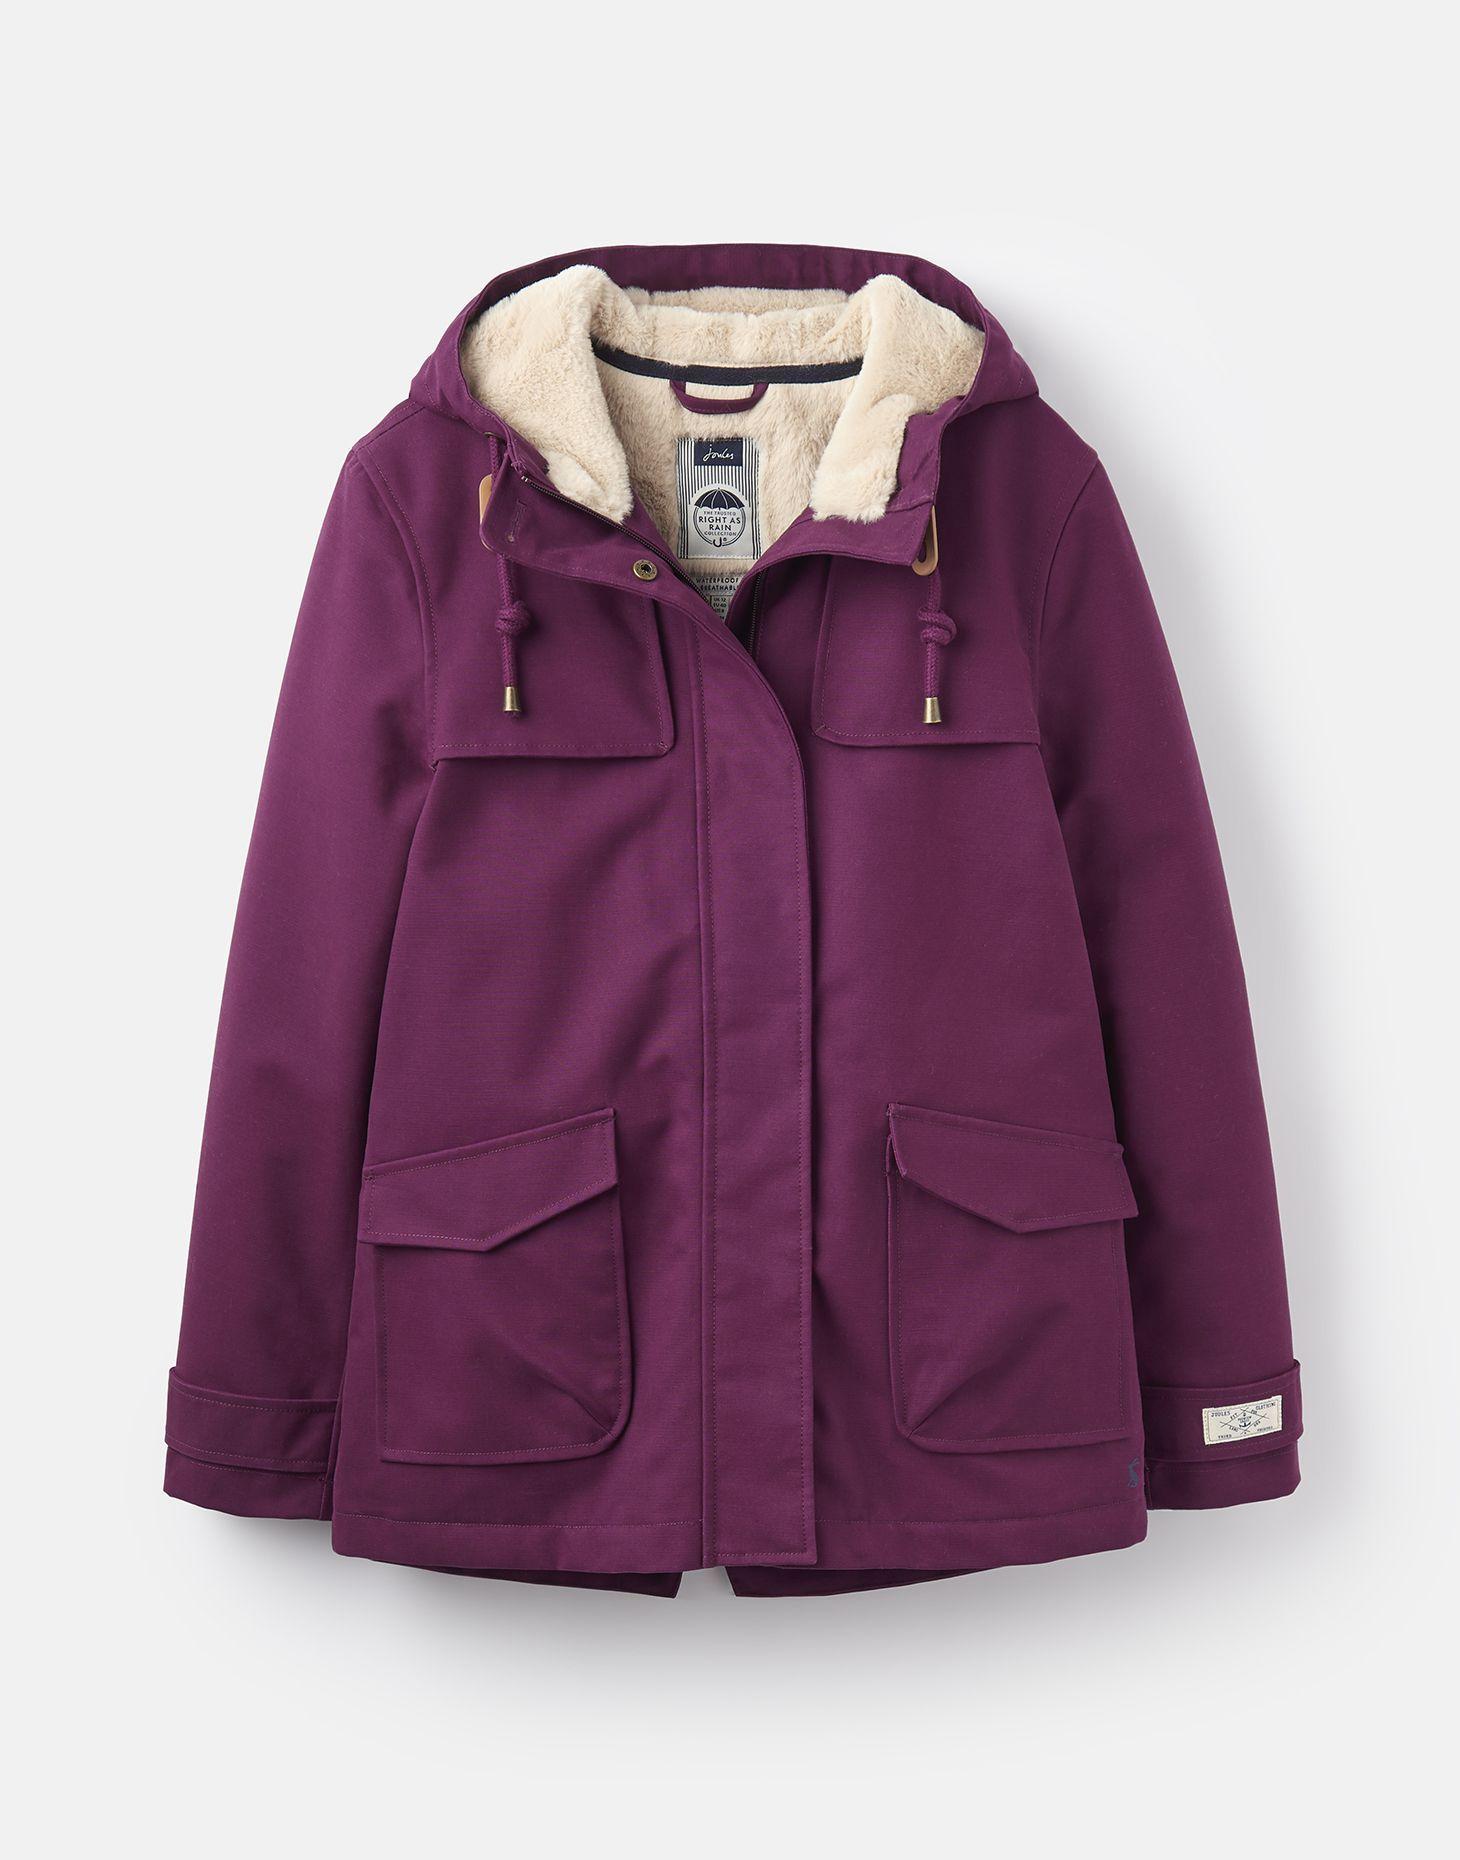 Coast Cosy Italian Plum Sherpa Fleece Lined Waterproof Jacket Joules Us Waterproof Jacket Waterproof Coat Jackets